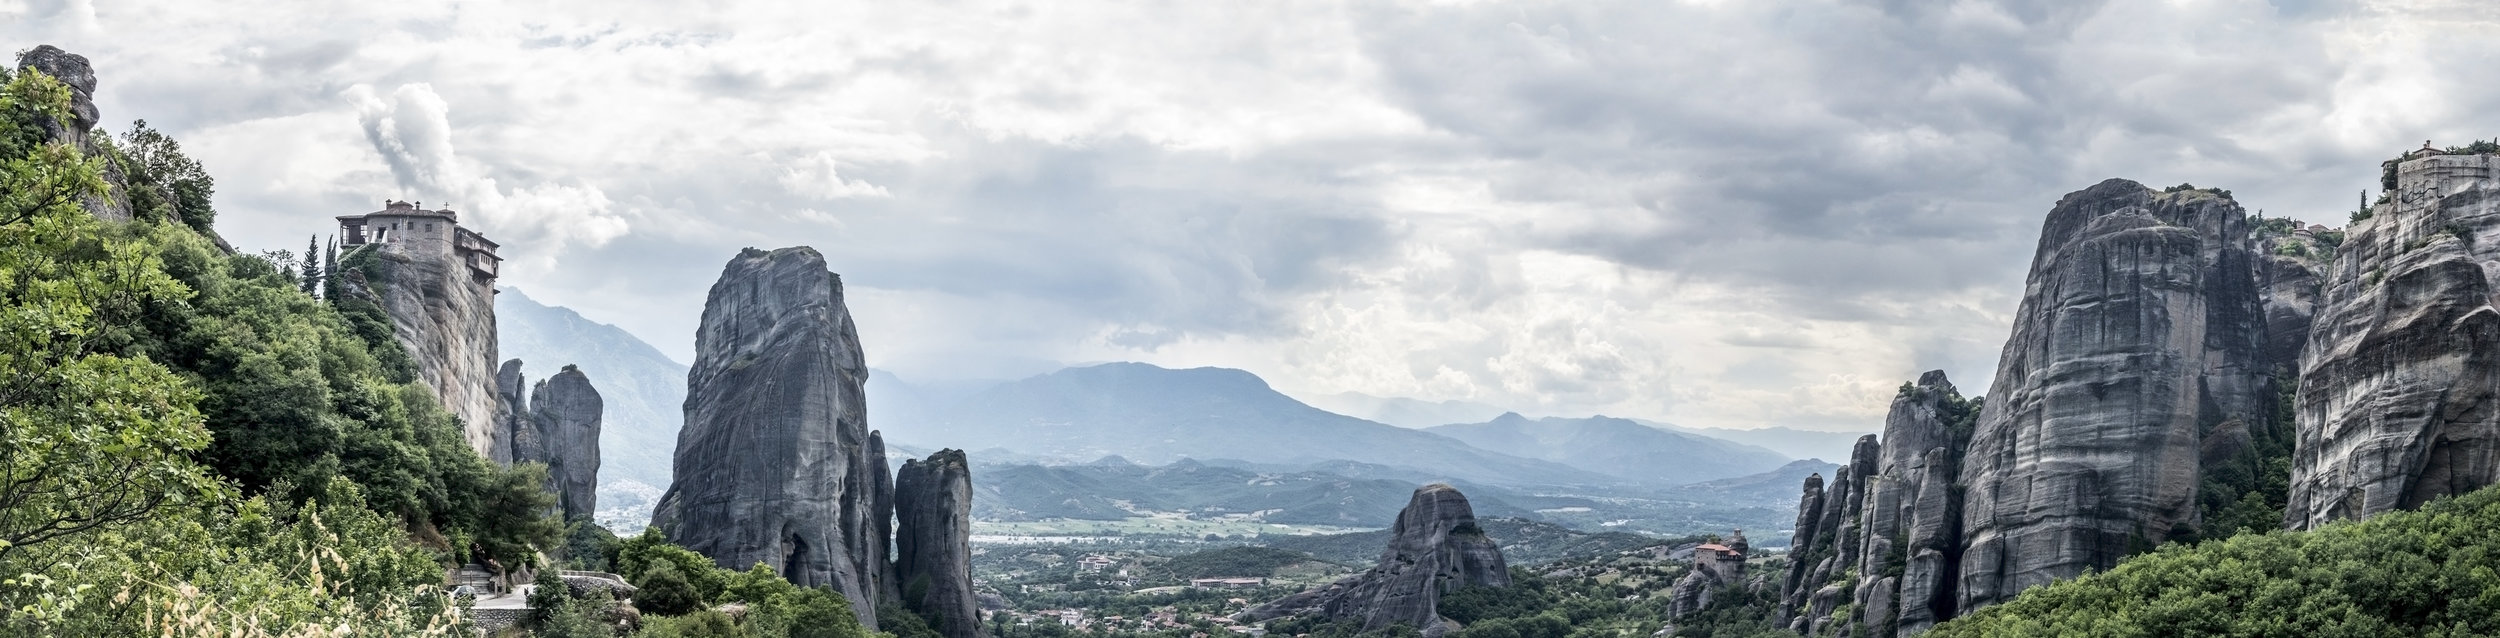 Meteora Pano 7.jpg